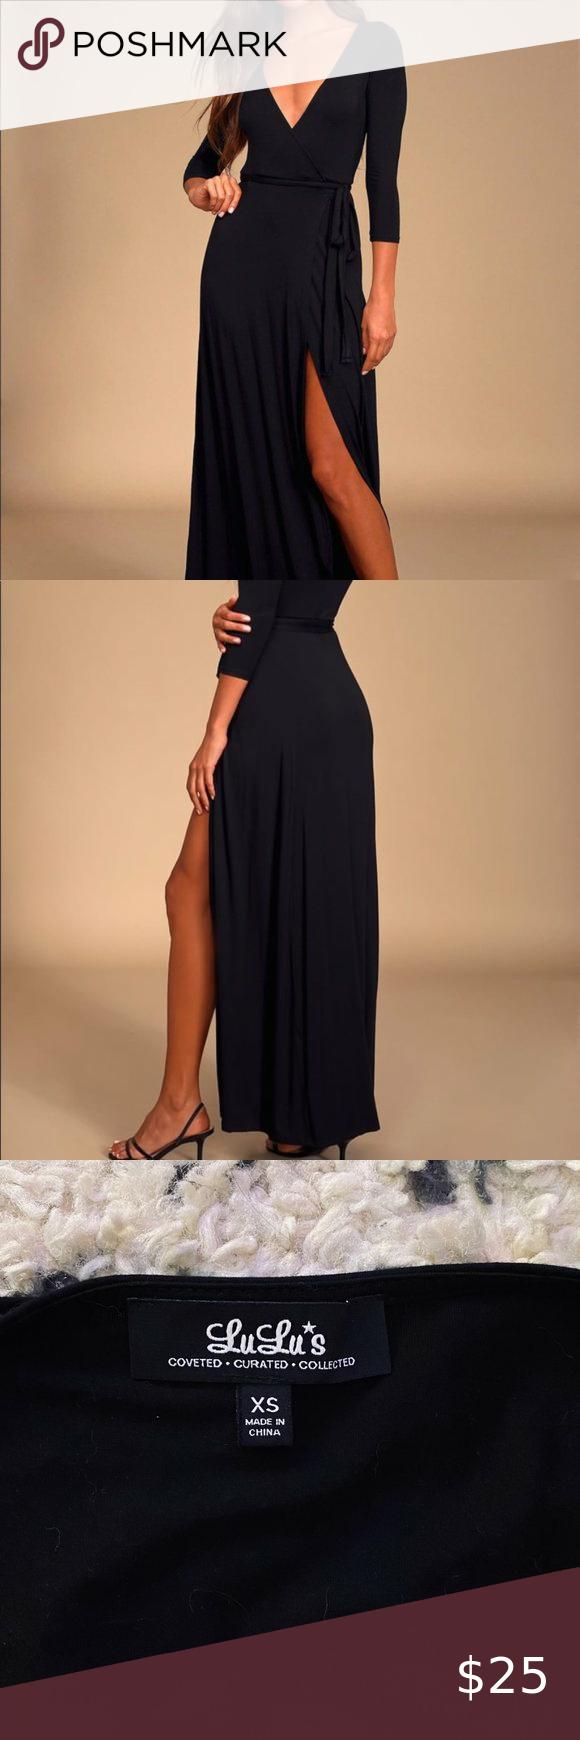 Garden District Black Wrap Maxi Dress Maxi Wrap Dress Maxi Dress Lulu Dresses [ 1740 x 580 Pixel ]